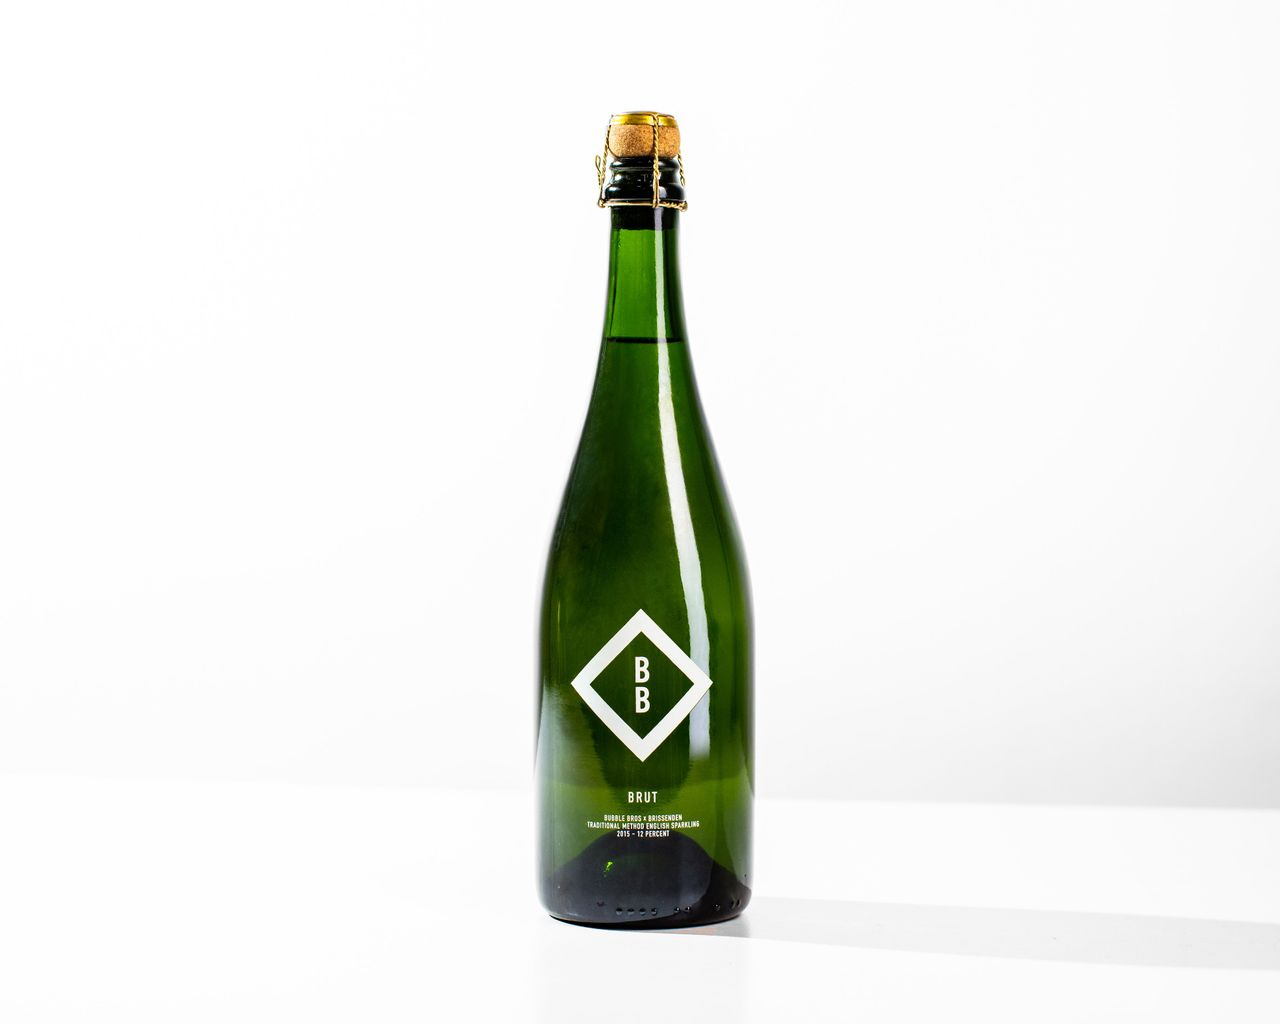 Bottle - BB Sparkling English Brut, Bubble Bros Ltd